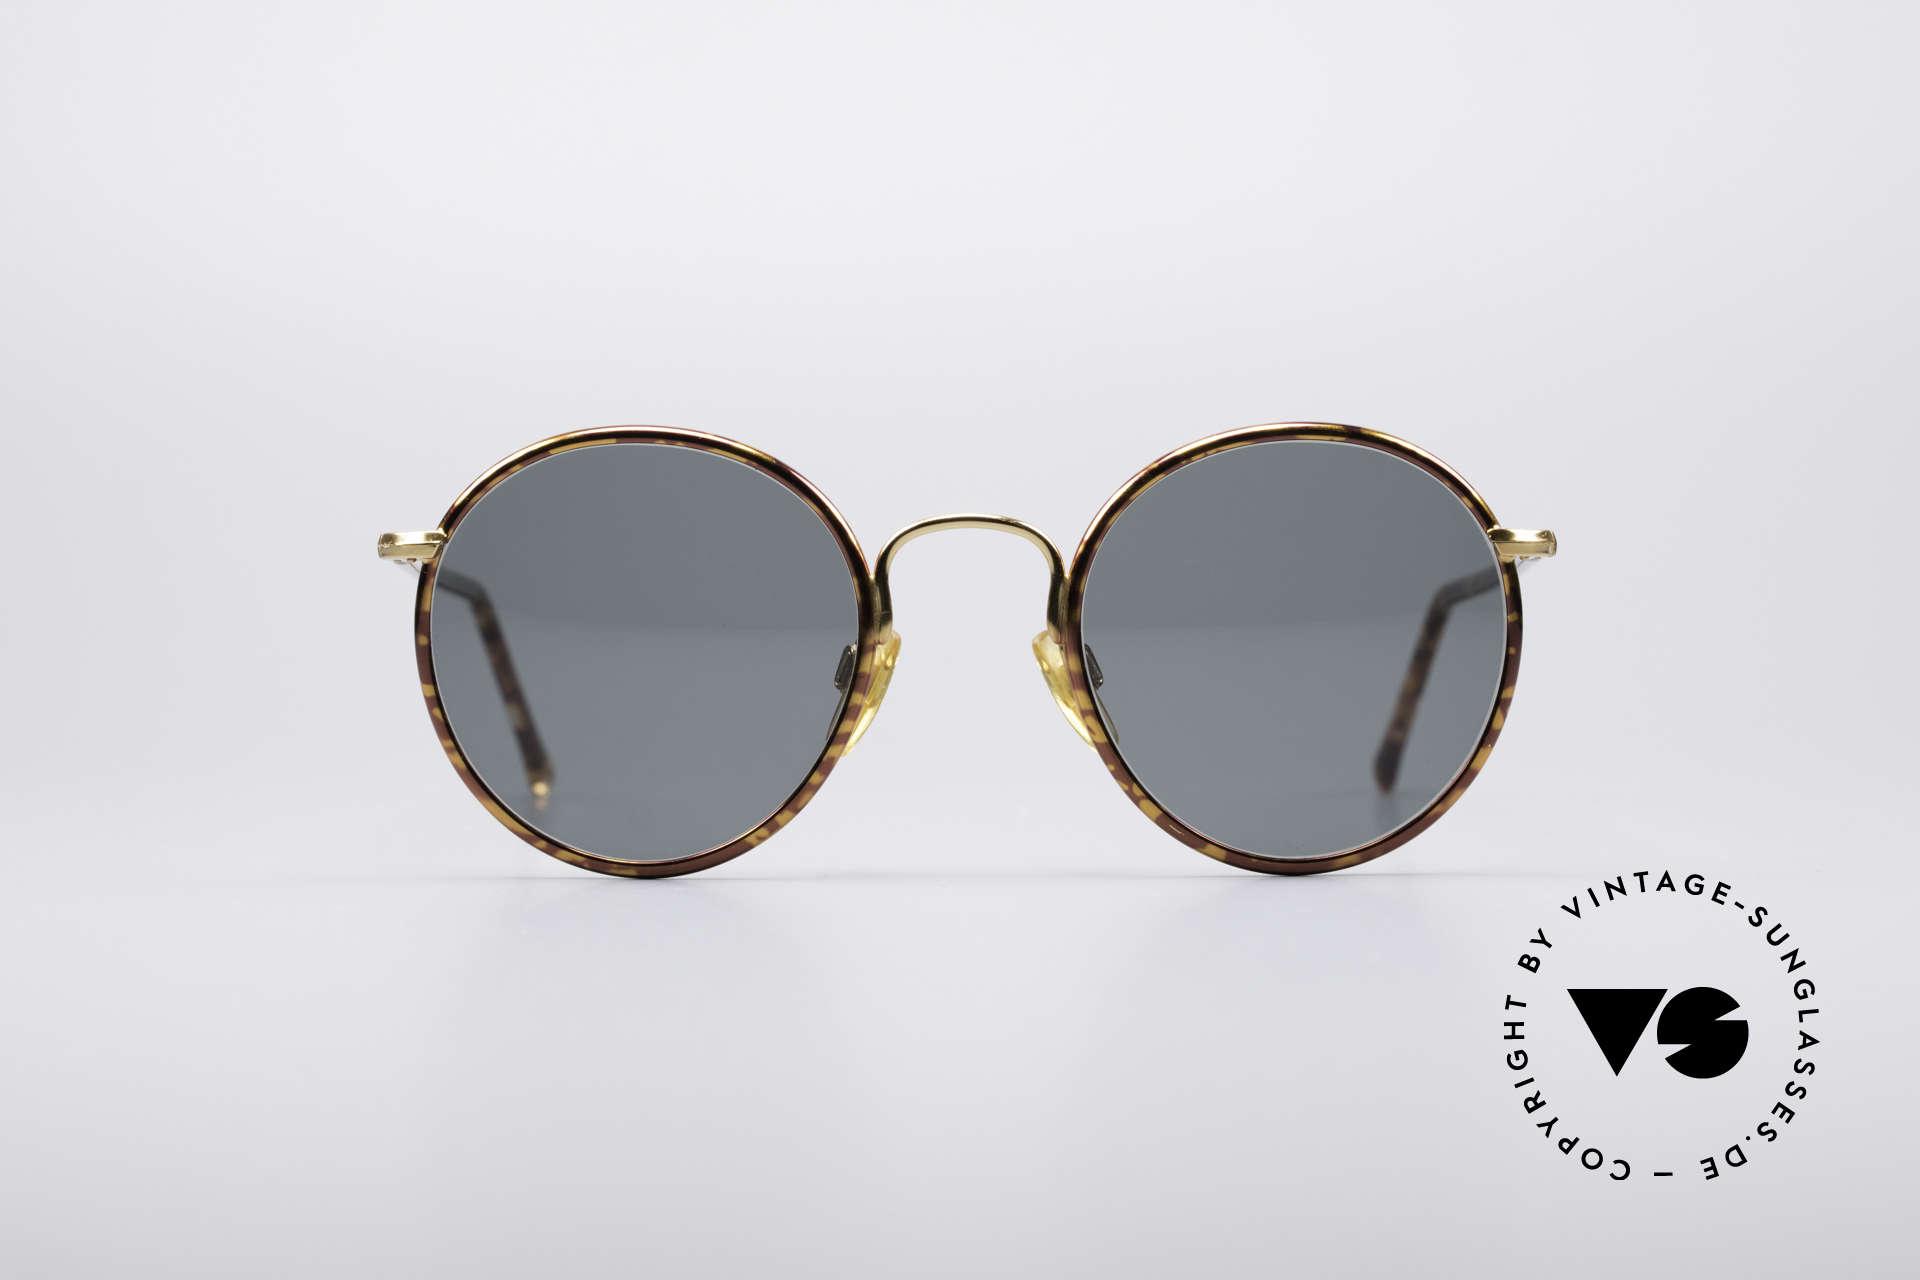 cb670348b2db Sunglasses Giorgio Armani 148 Small 90 s Panto Glasses